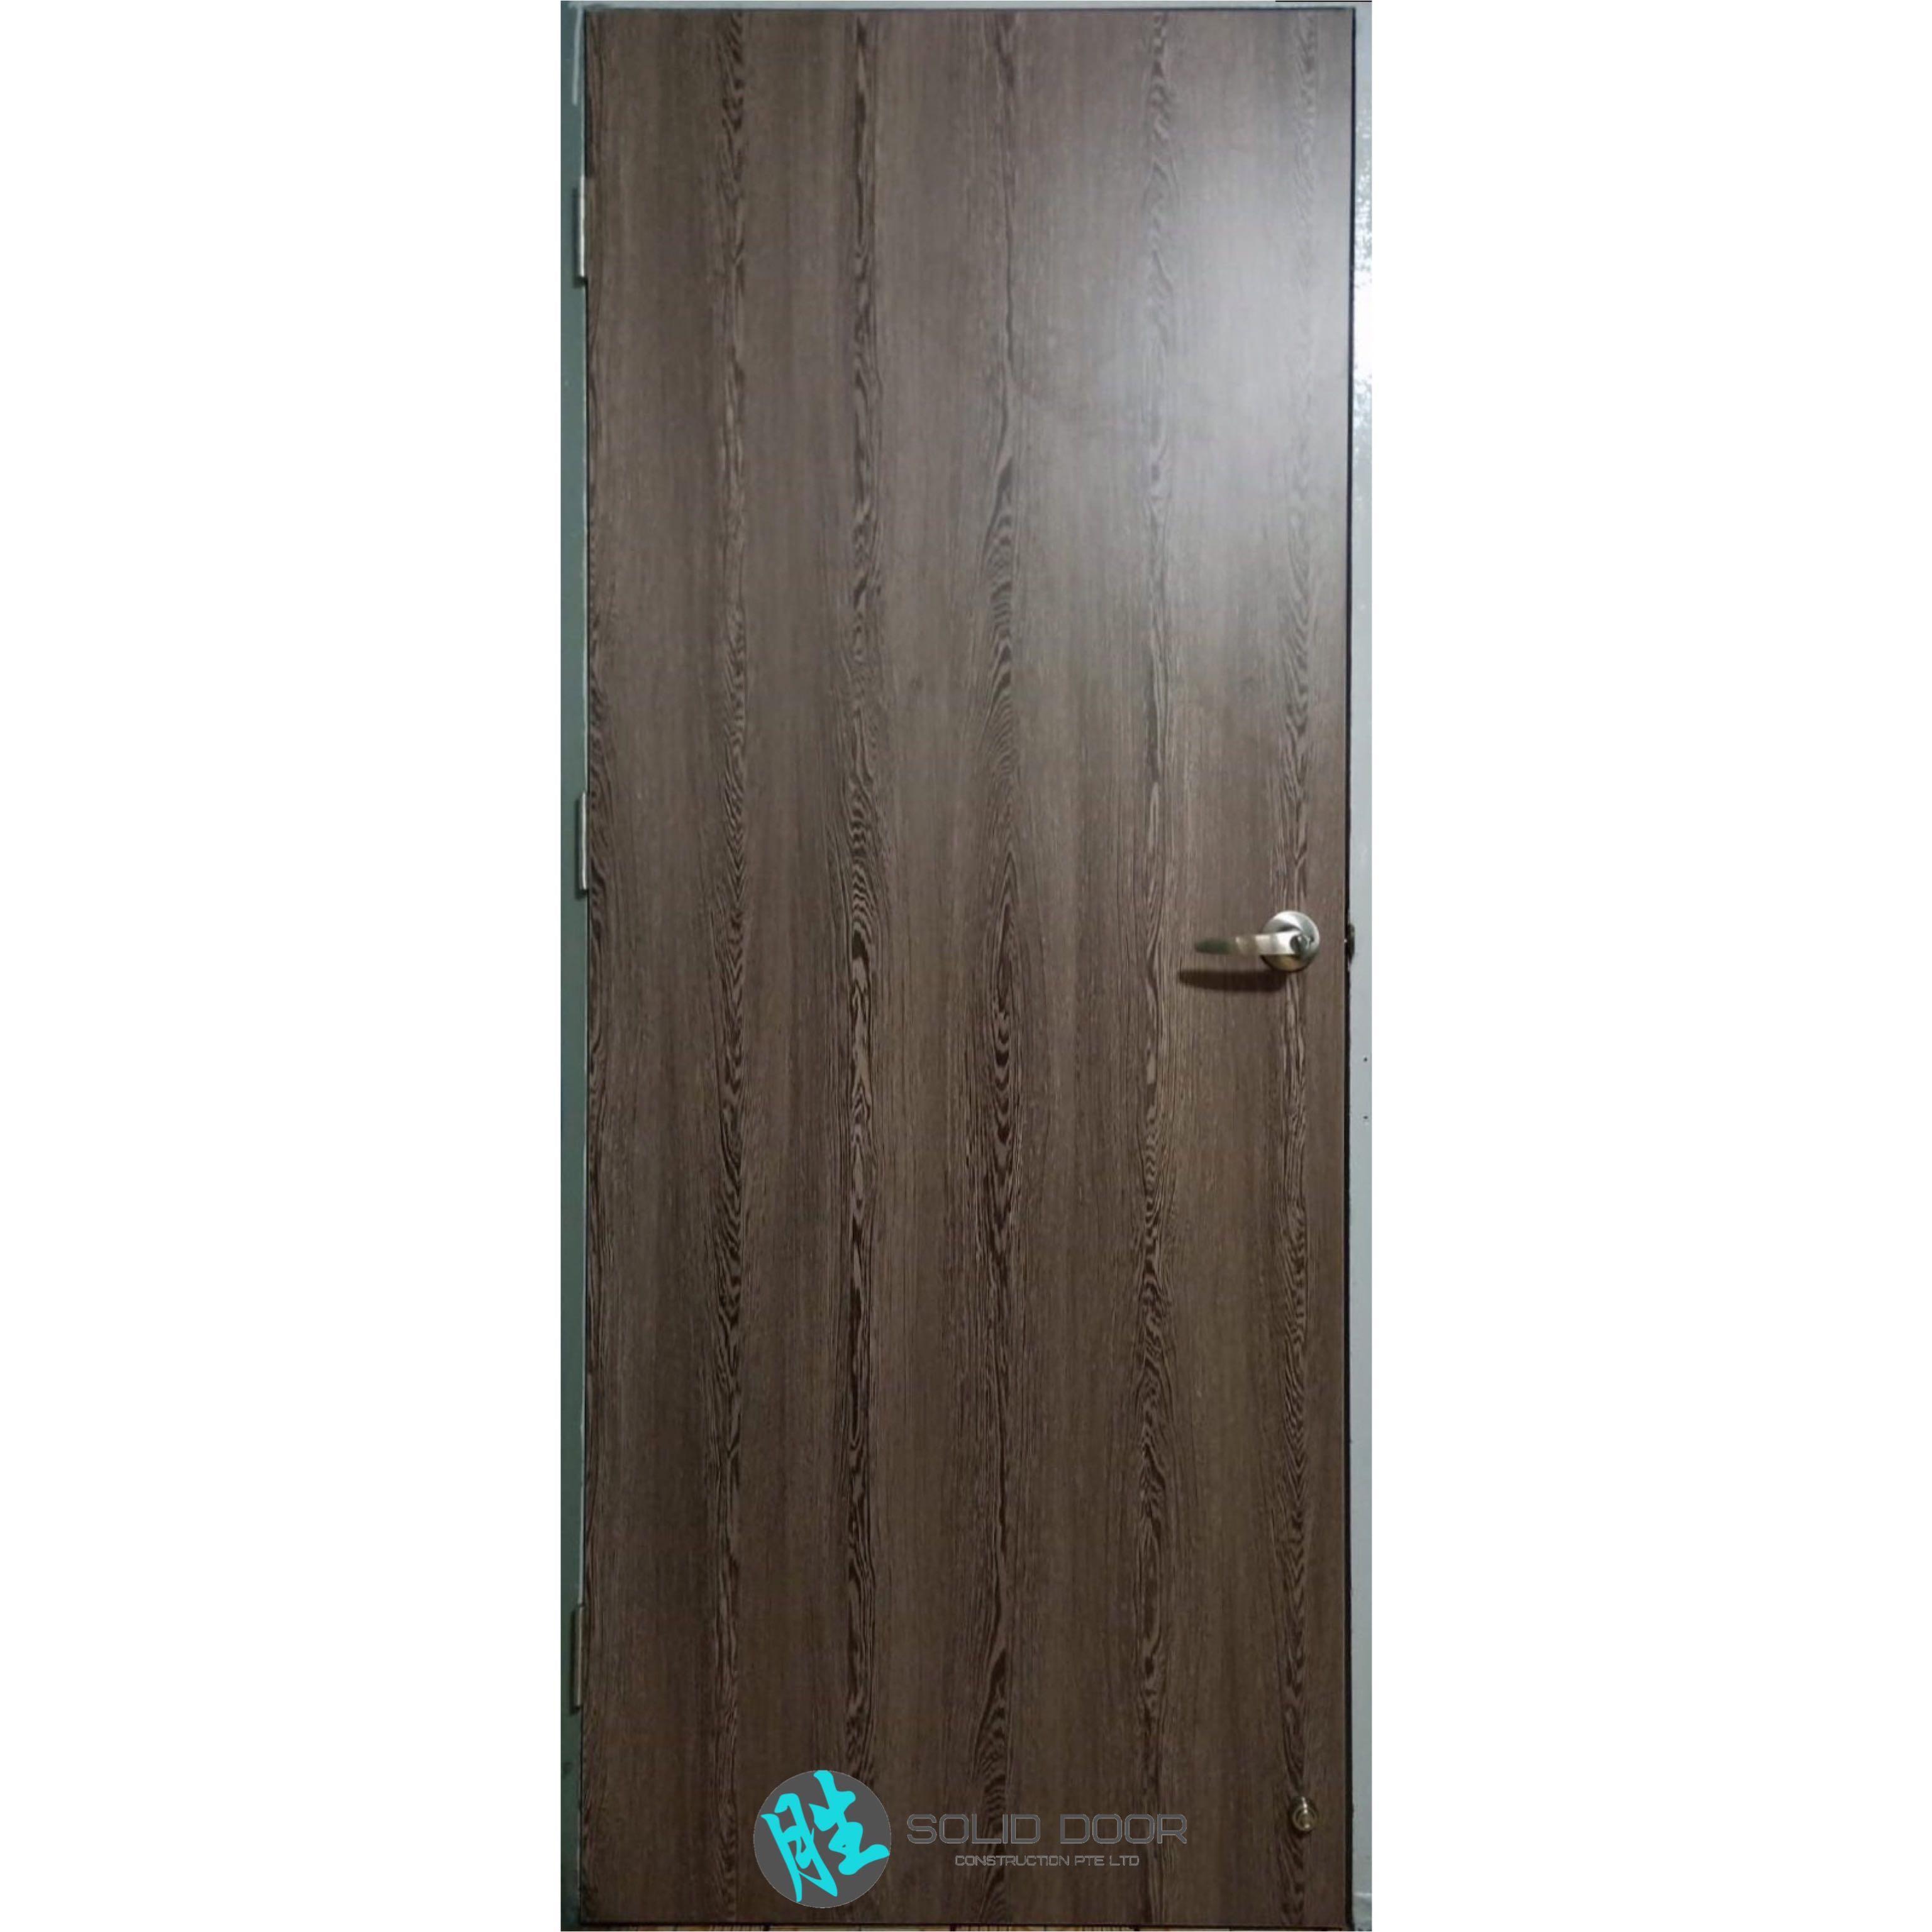 High Pressure Laminate Door for HDB & BTO BEDROOMS